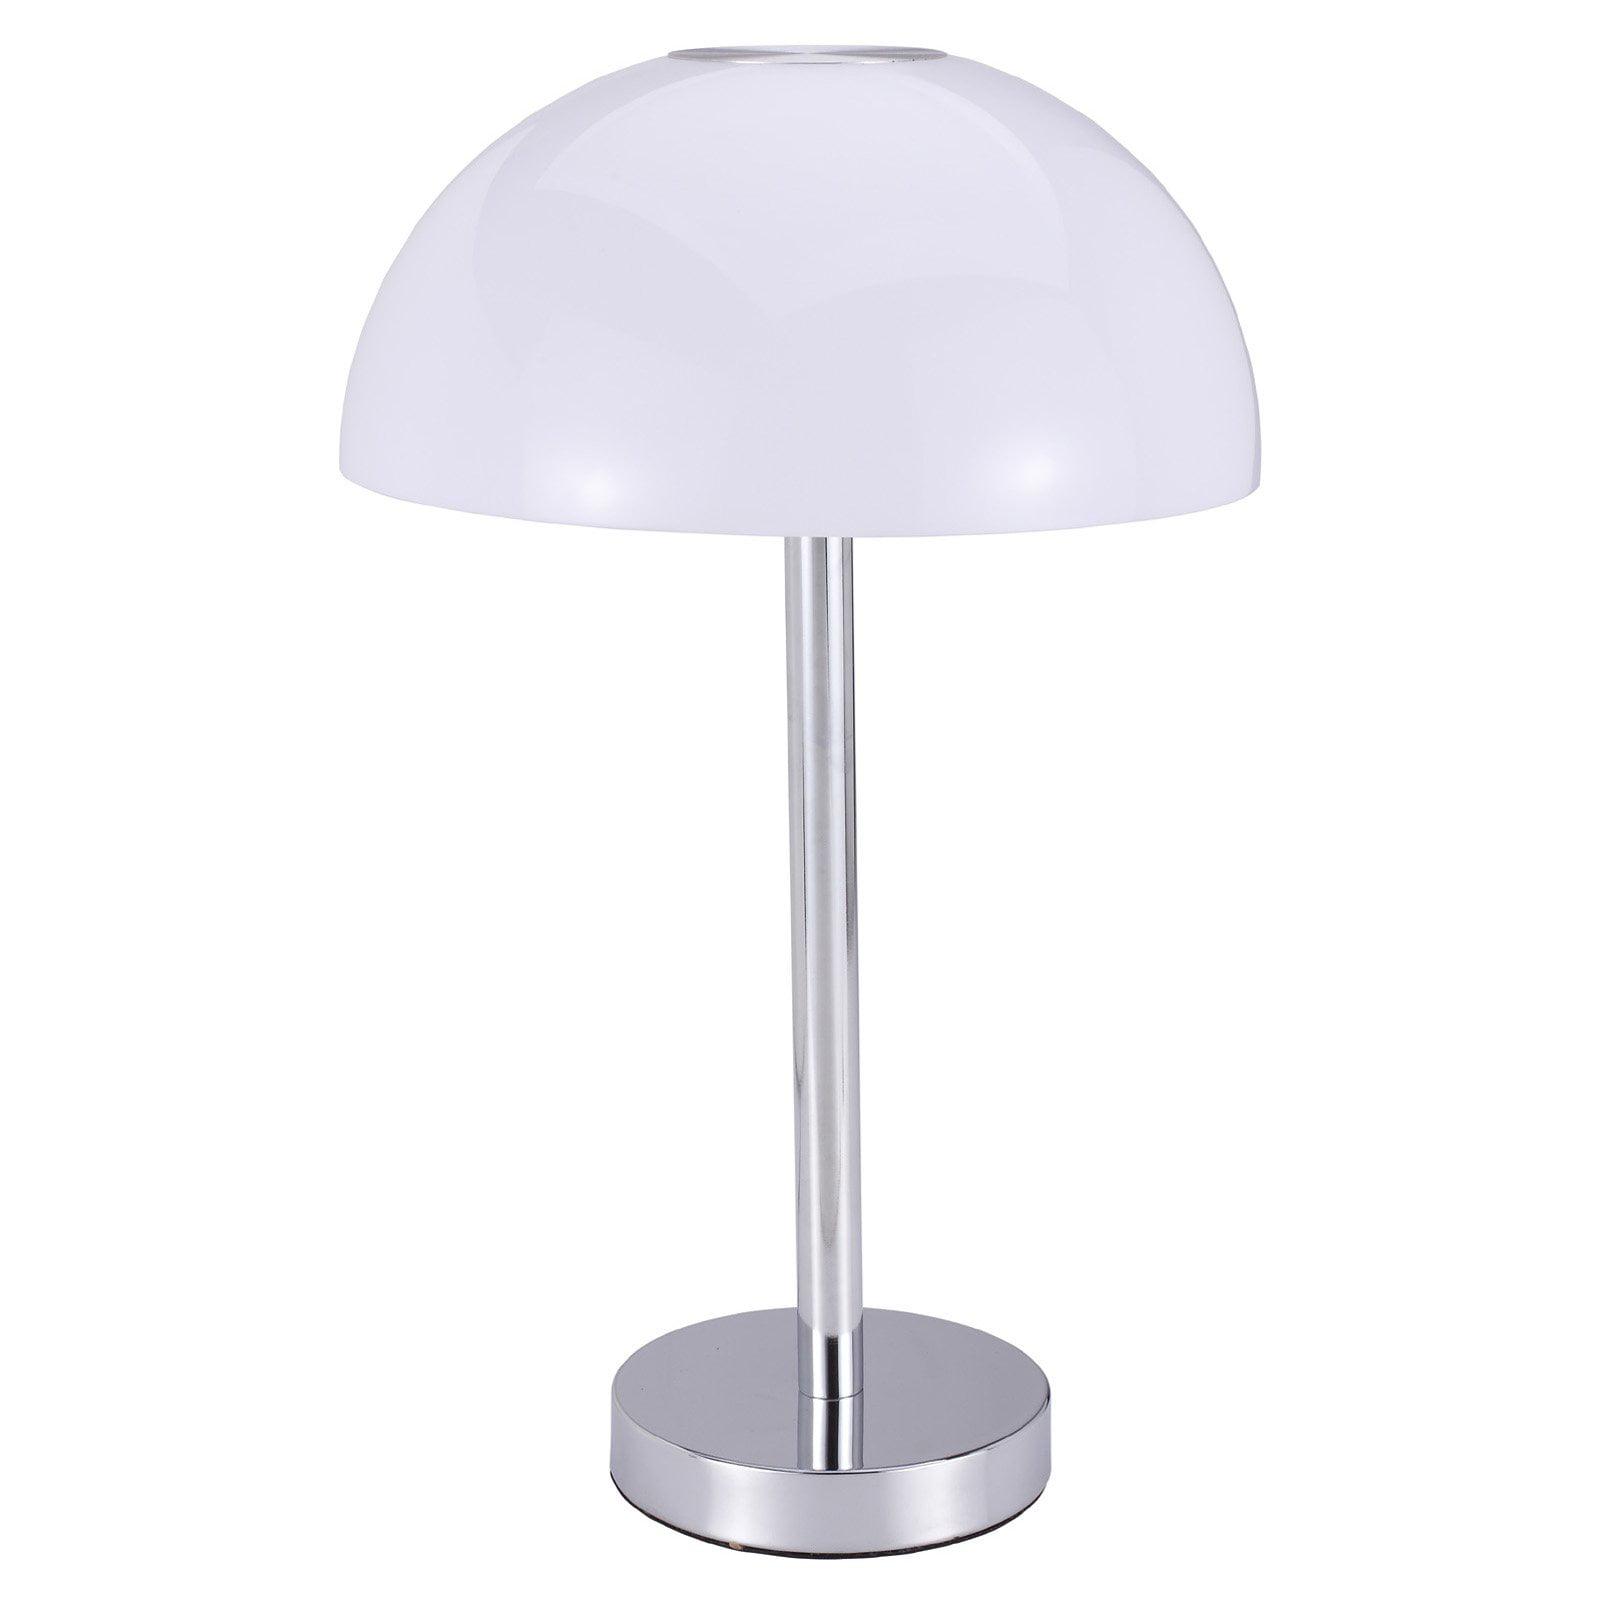 Ore International 6273 LED Light Table Touch Lamp - Walmart.com